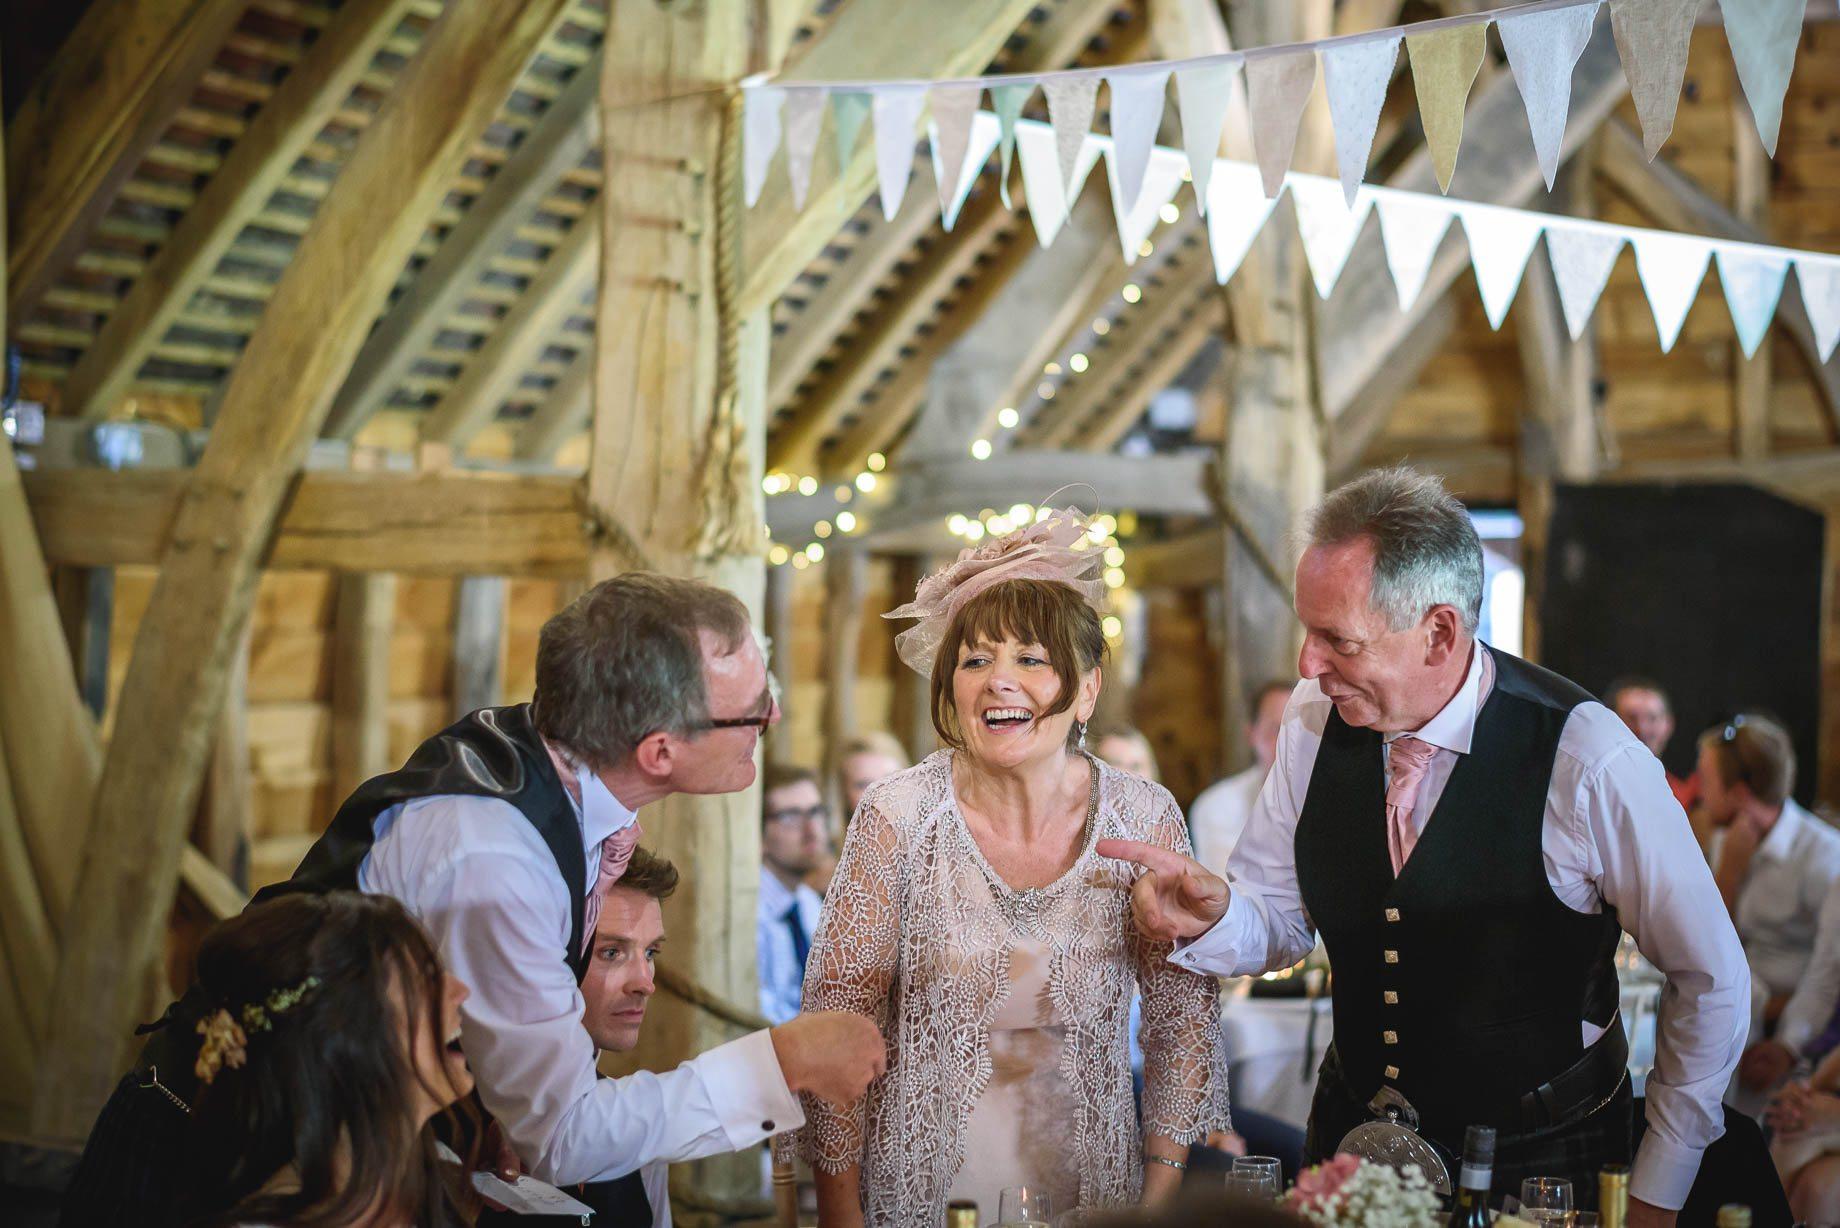 Gildings Barn wedding photography - Sarah and Steve (135 of 190)